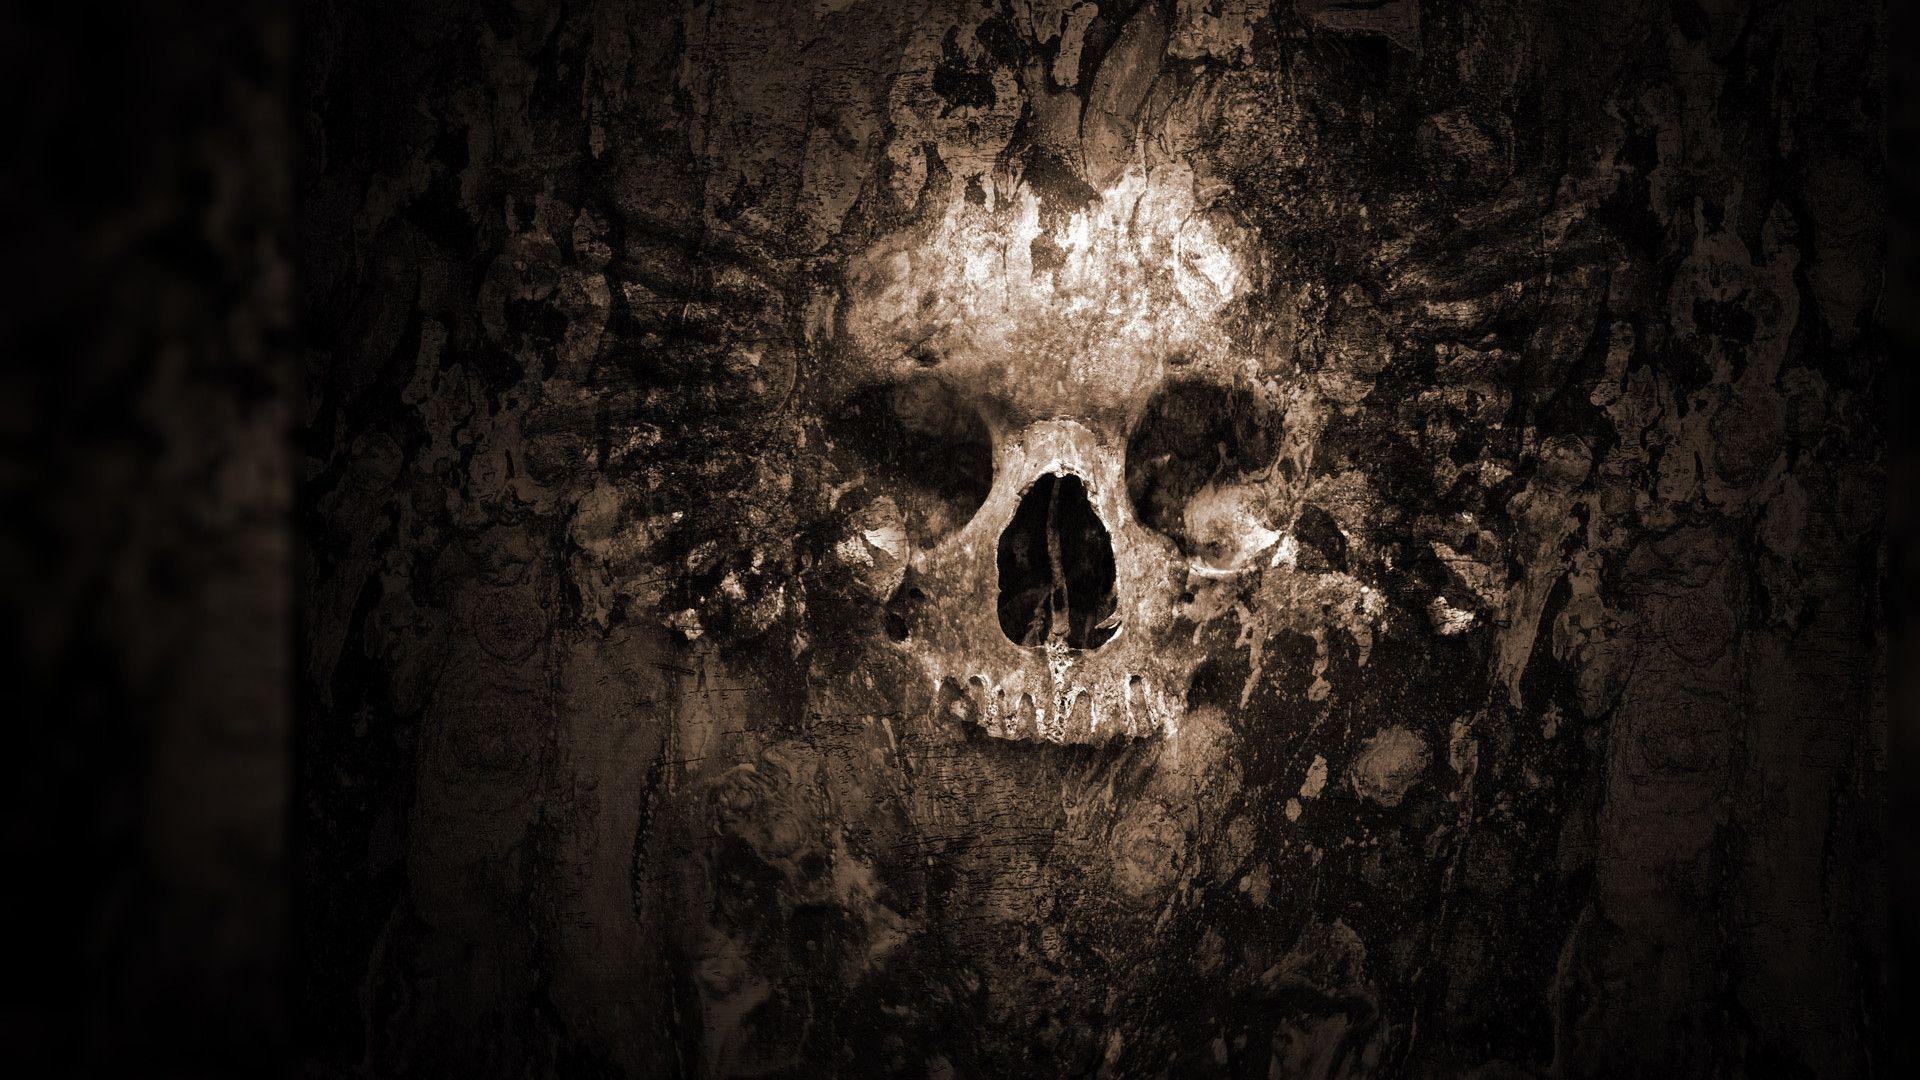 Creepy Halloween Backgrounds – Wallpaper Cave. Creepy Halloween Backgrounds  Wallpaper Cave